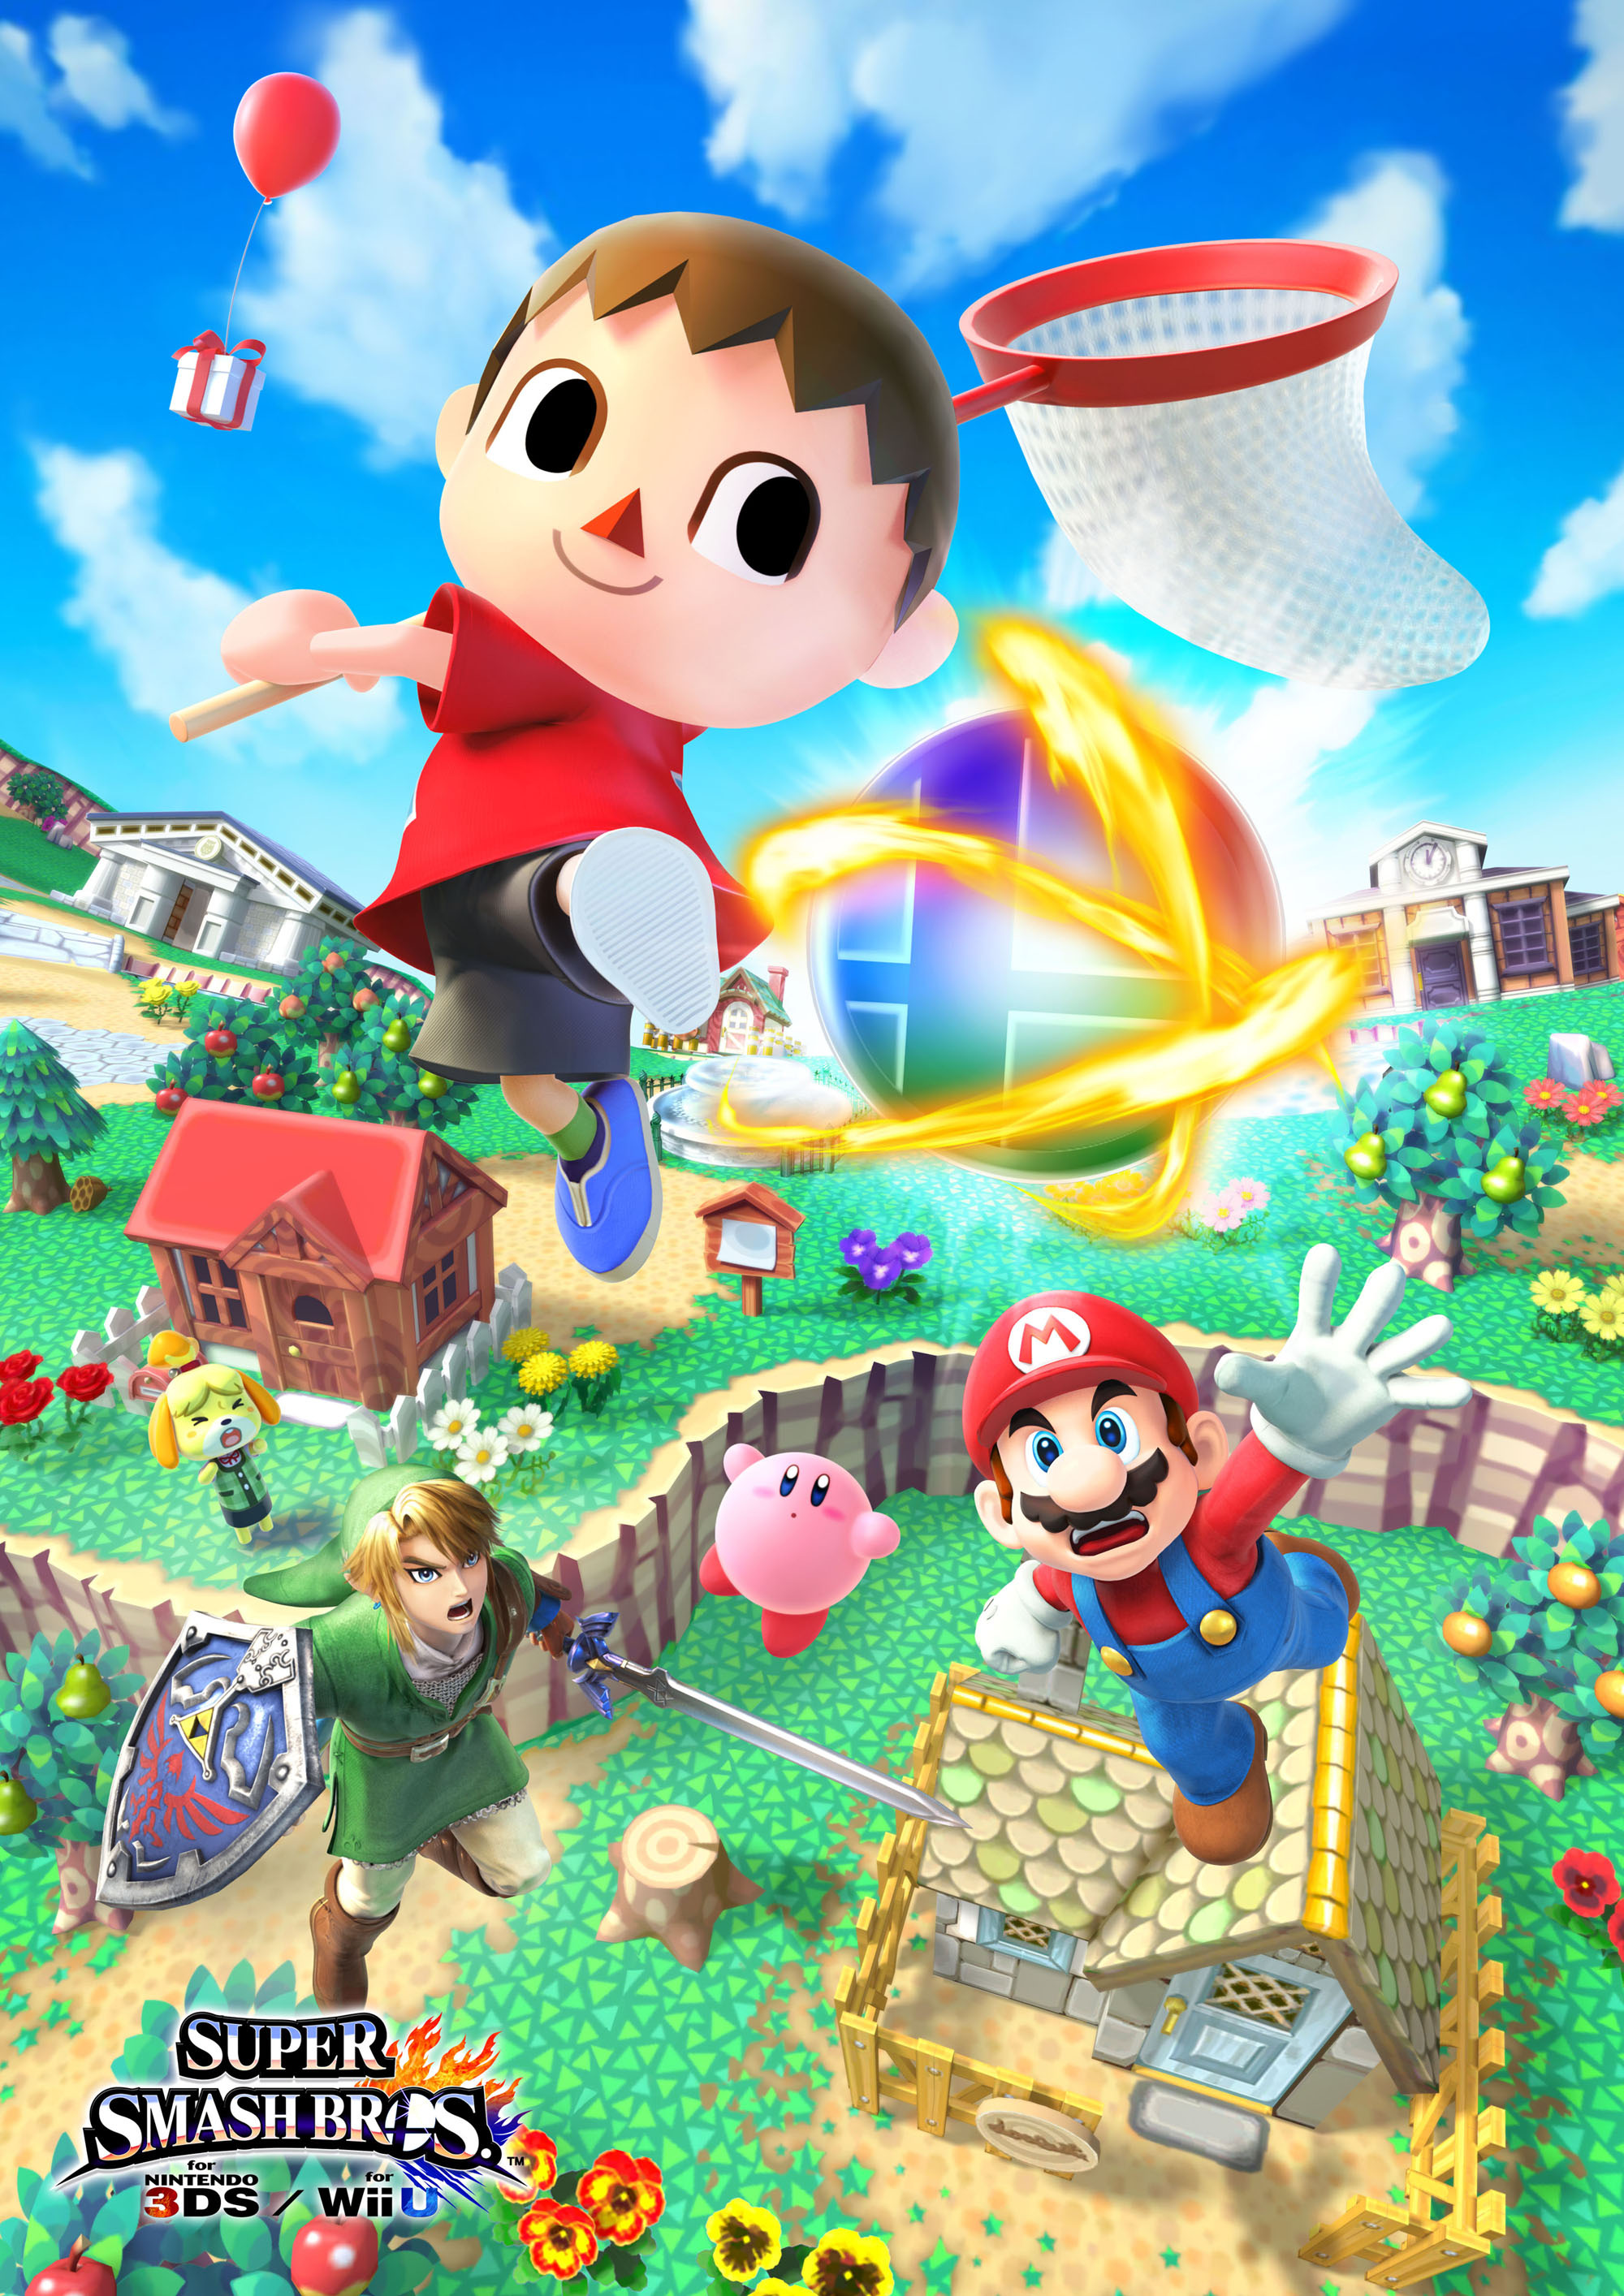 Smash Bros Wii U : Comparatif super smash bros wii u les gameusesles gameuses